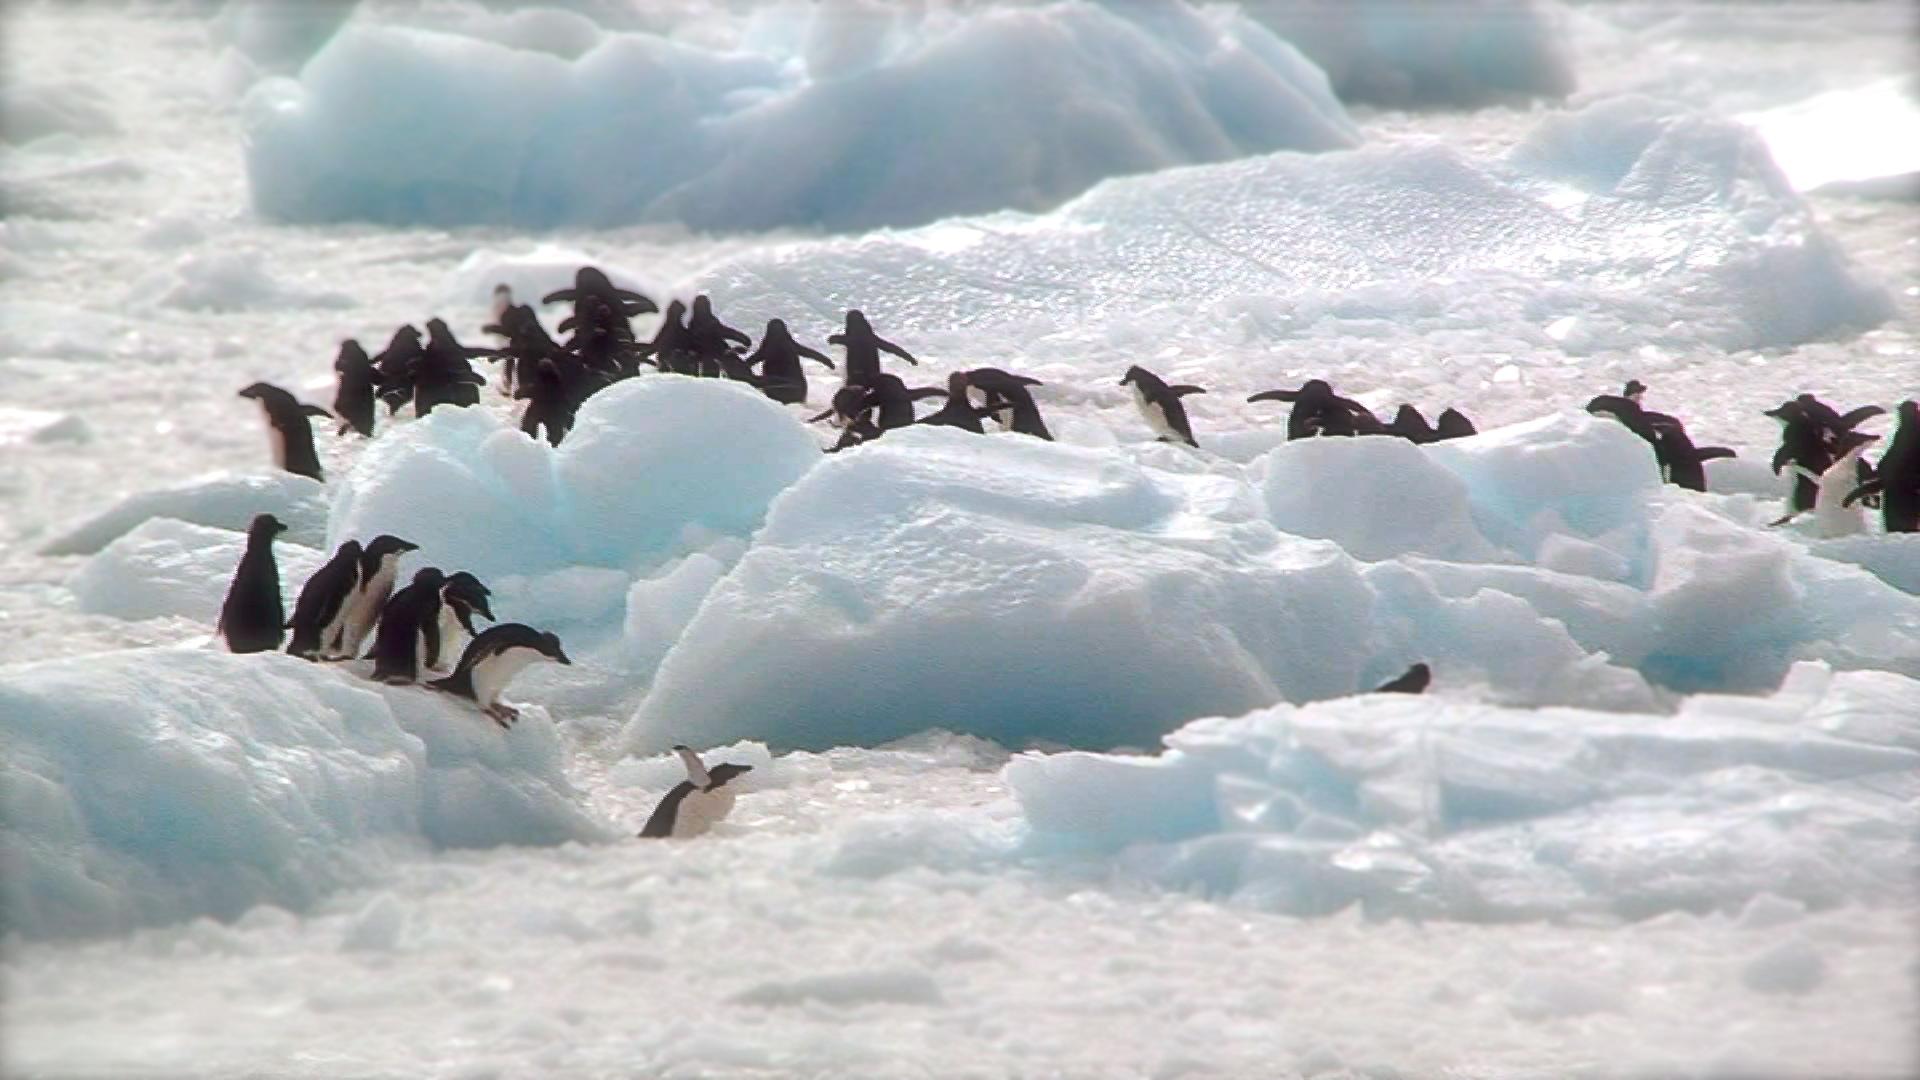 antarctic animals the penguins essay Meet all 6 antarctic penguin species this falkland islands, south georgia, and antarctic peninsula cruise is an animal-lover's dream come true.